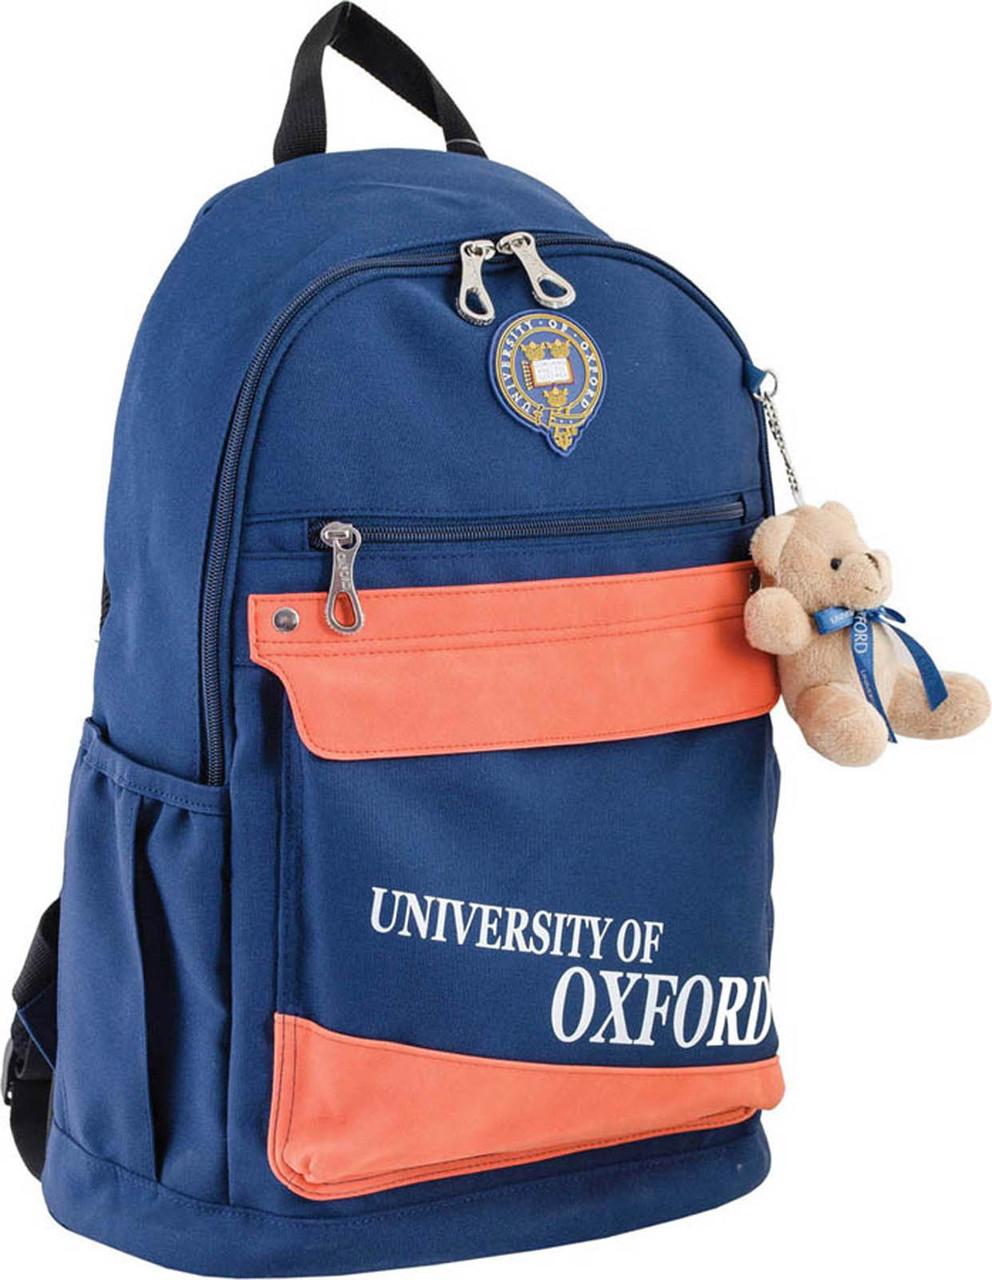 Рюкзак подростковый OX 288, синий, 30.5*46.5*17